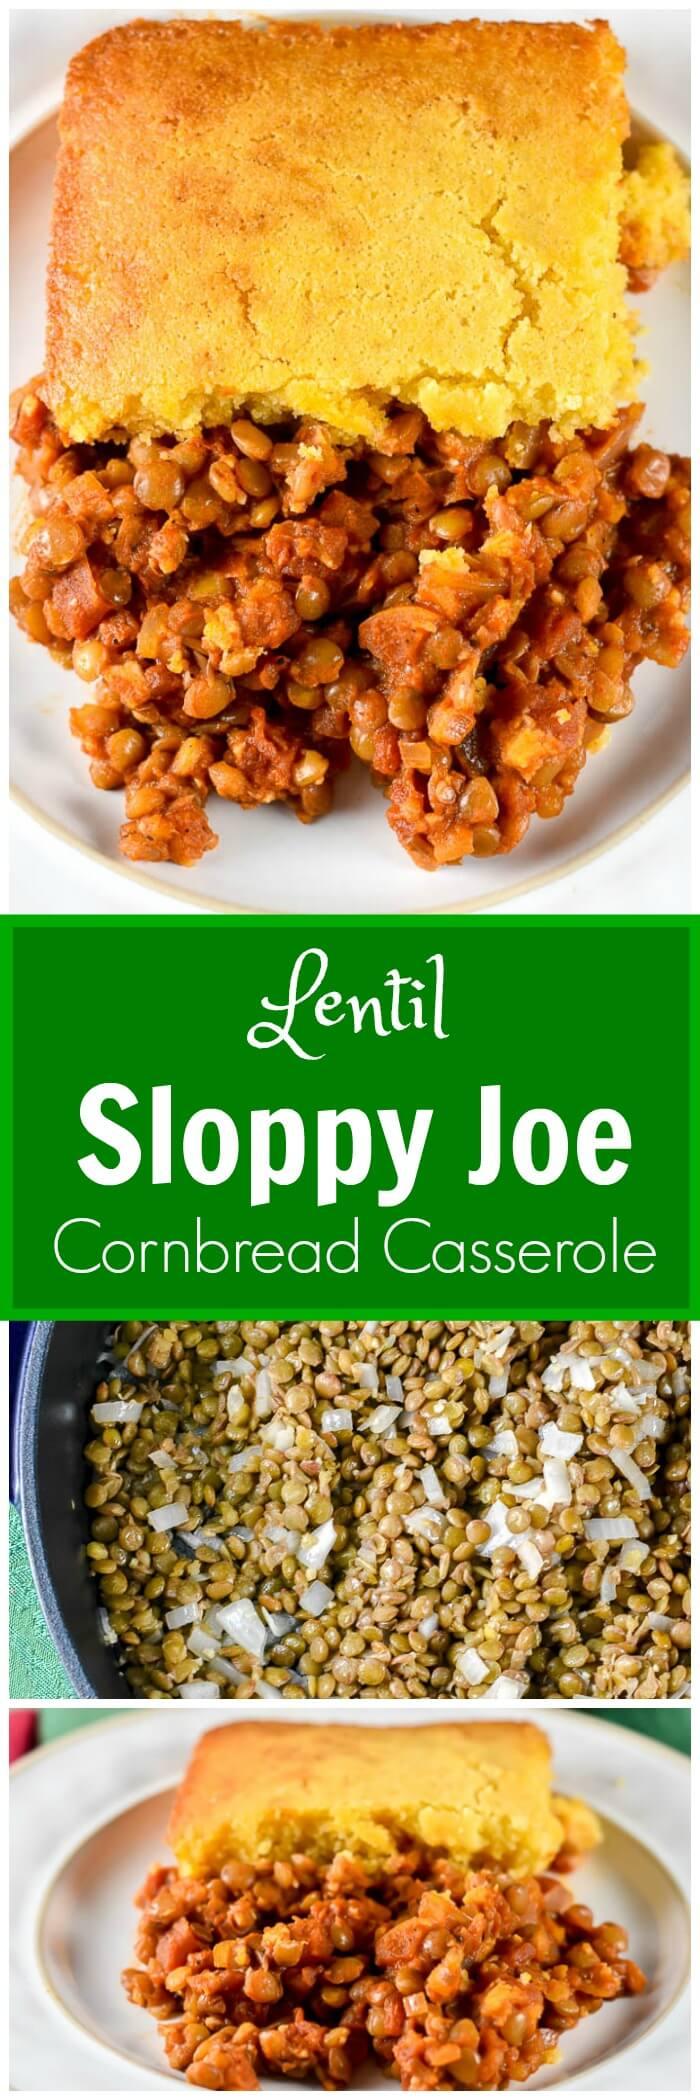 Lentil Sloppy Joe Cornbread